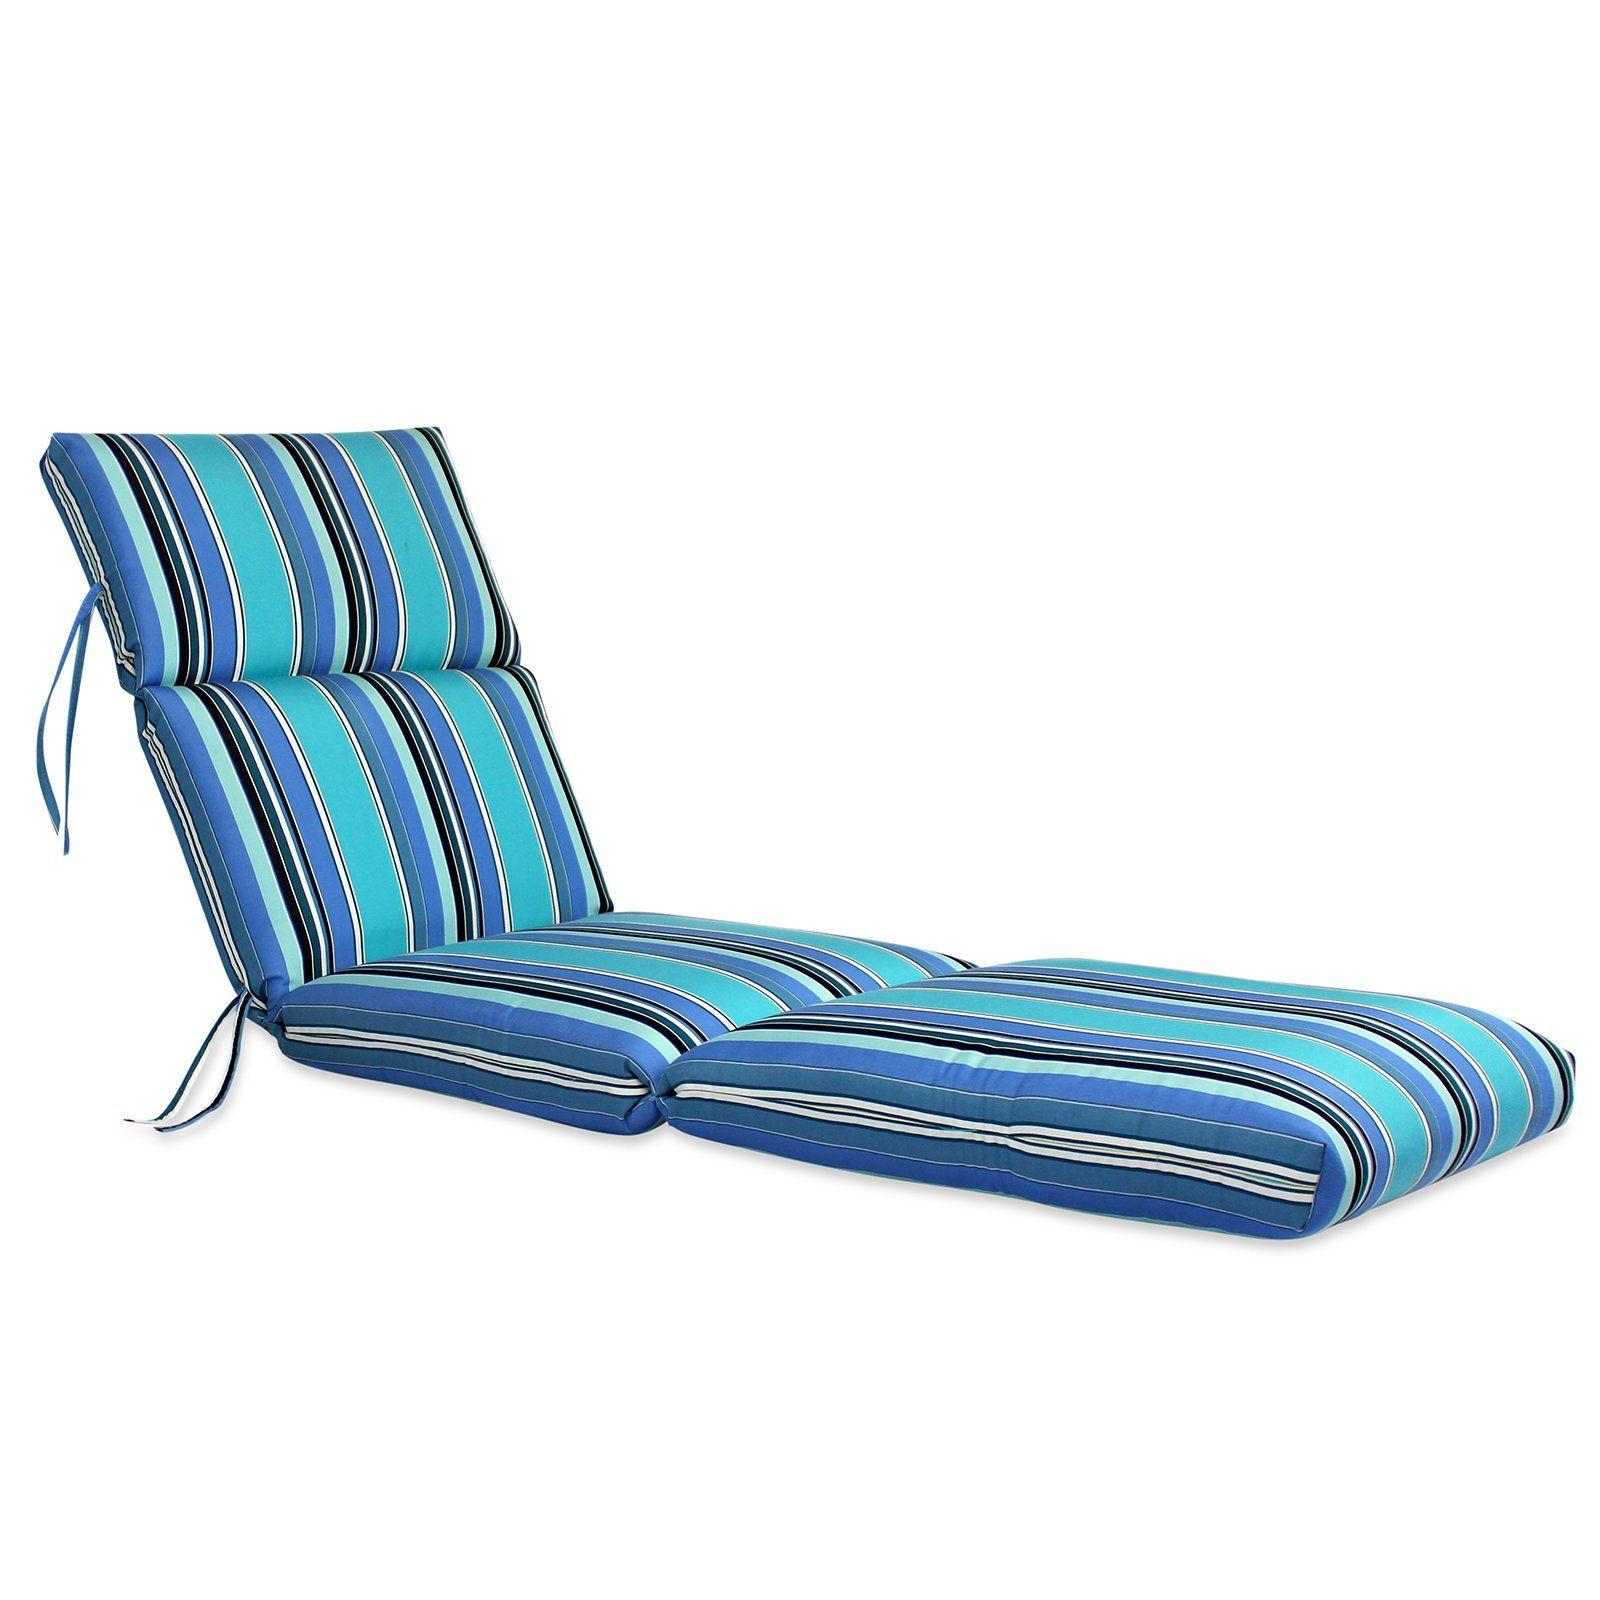 Comfort Classics 72 X 22 In Sunbrella Channeled Chaise Lounge